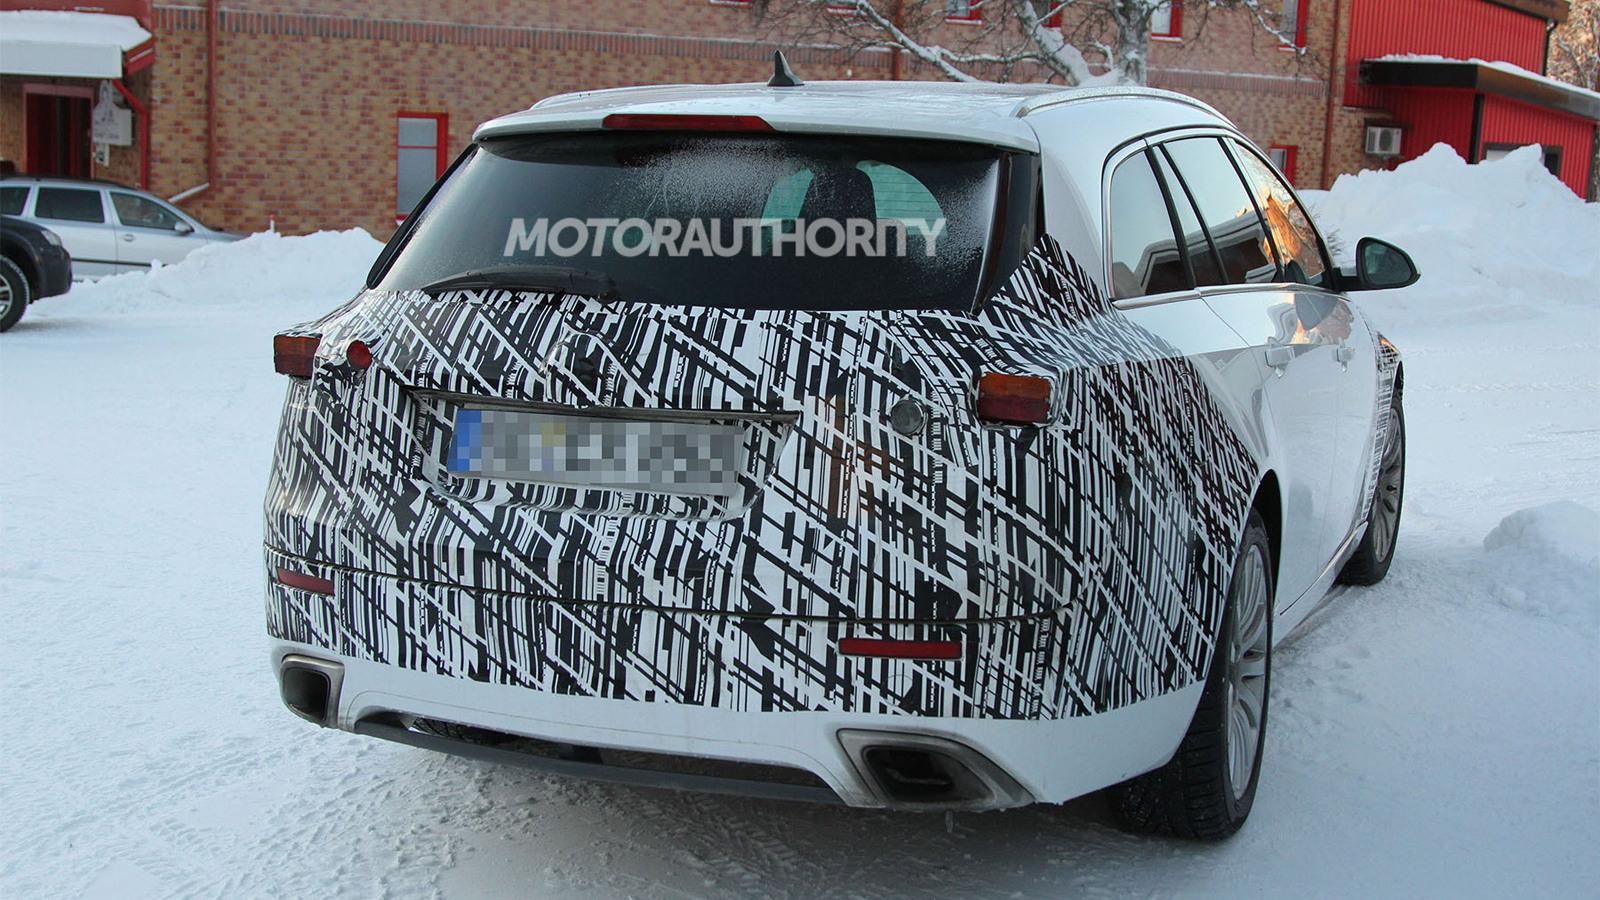 2013 Opel Insignia Sports Tourer facelift spy shots